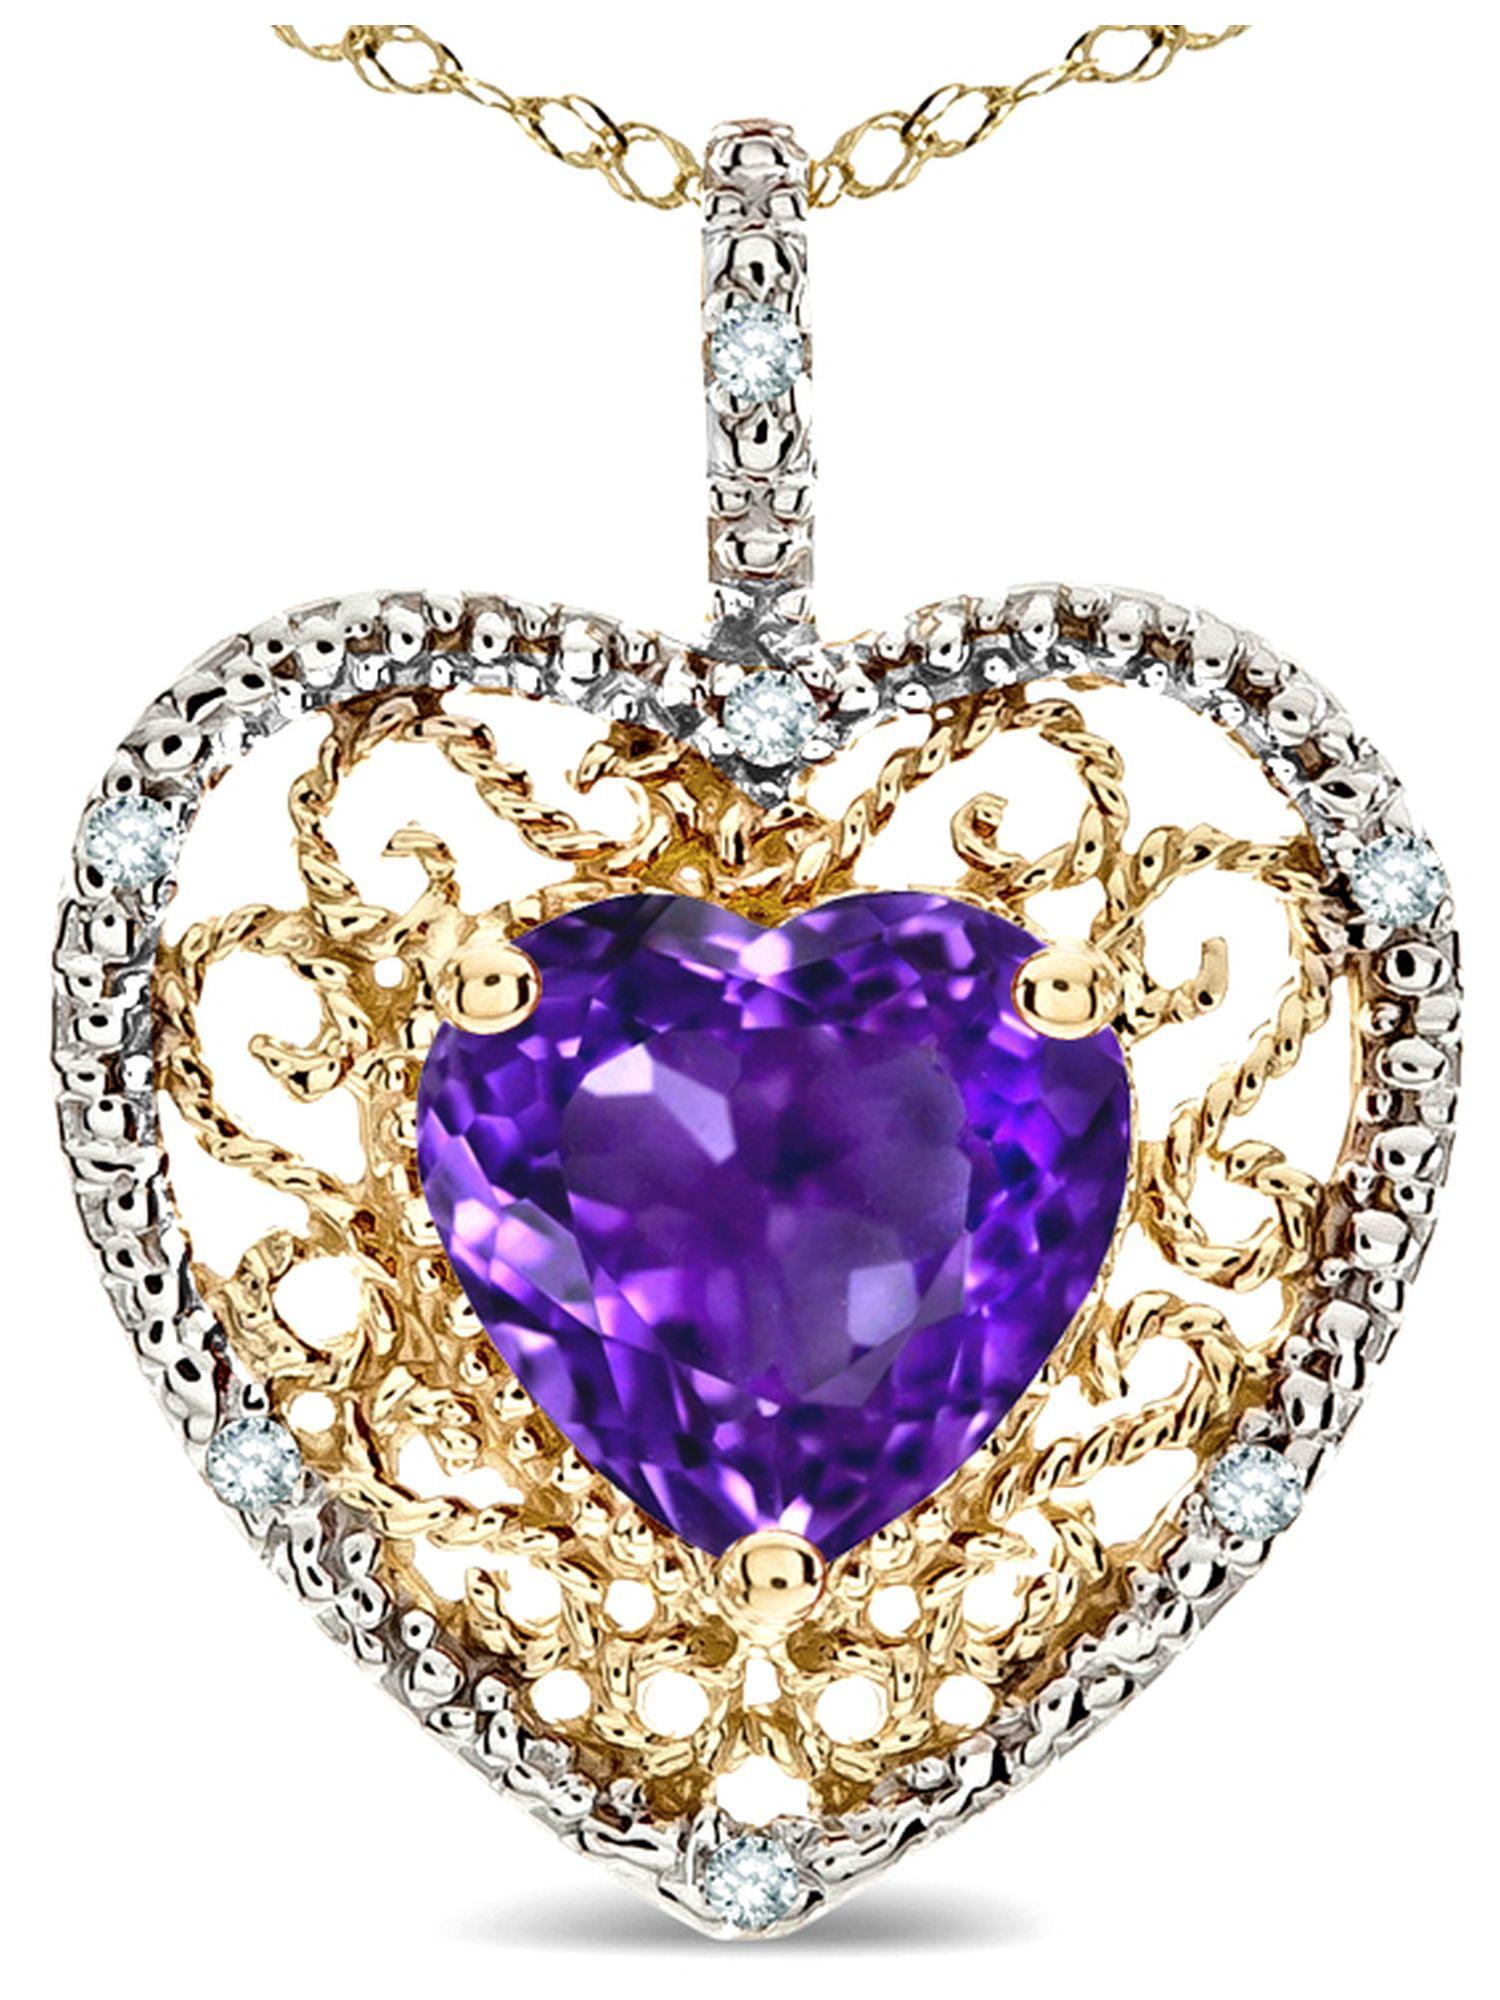 Star K Heart Shape 8mm Genuine Amethyst filigree Heart Pendant Necklace 10k Yellow Gold